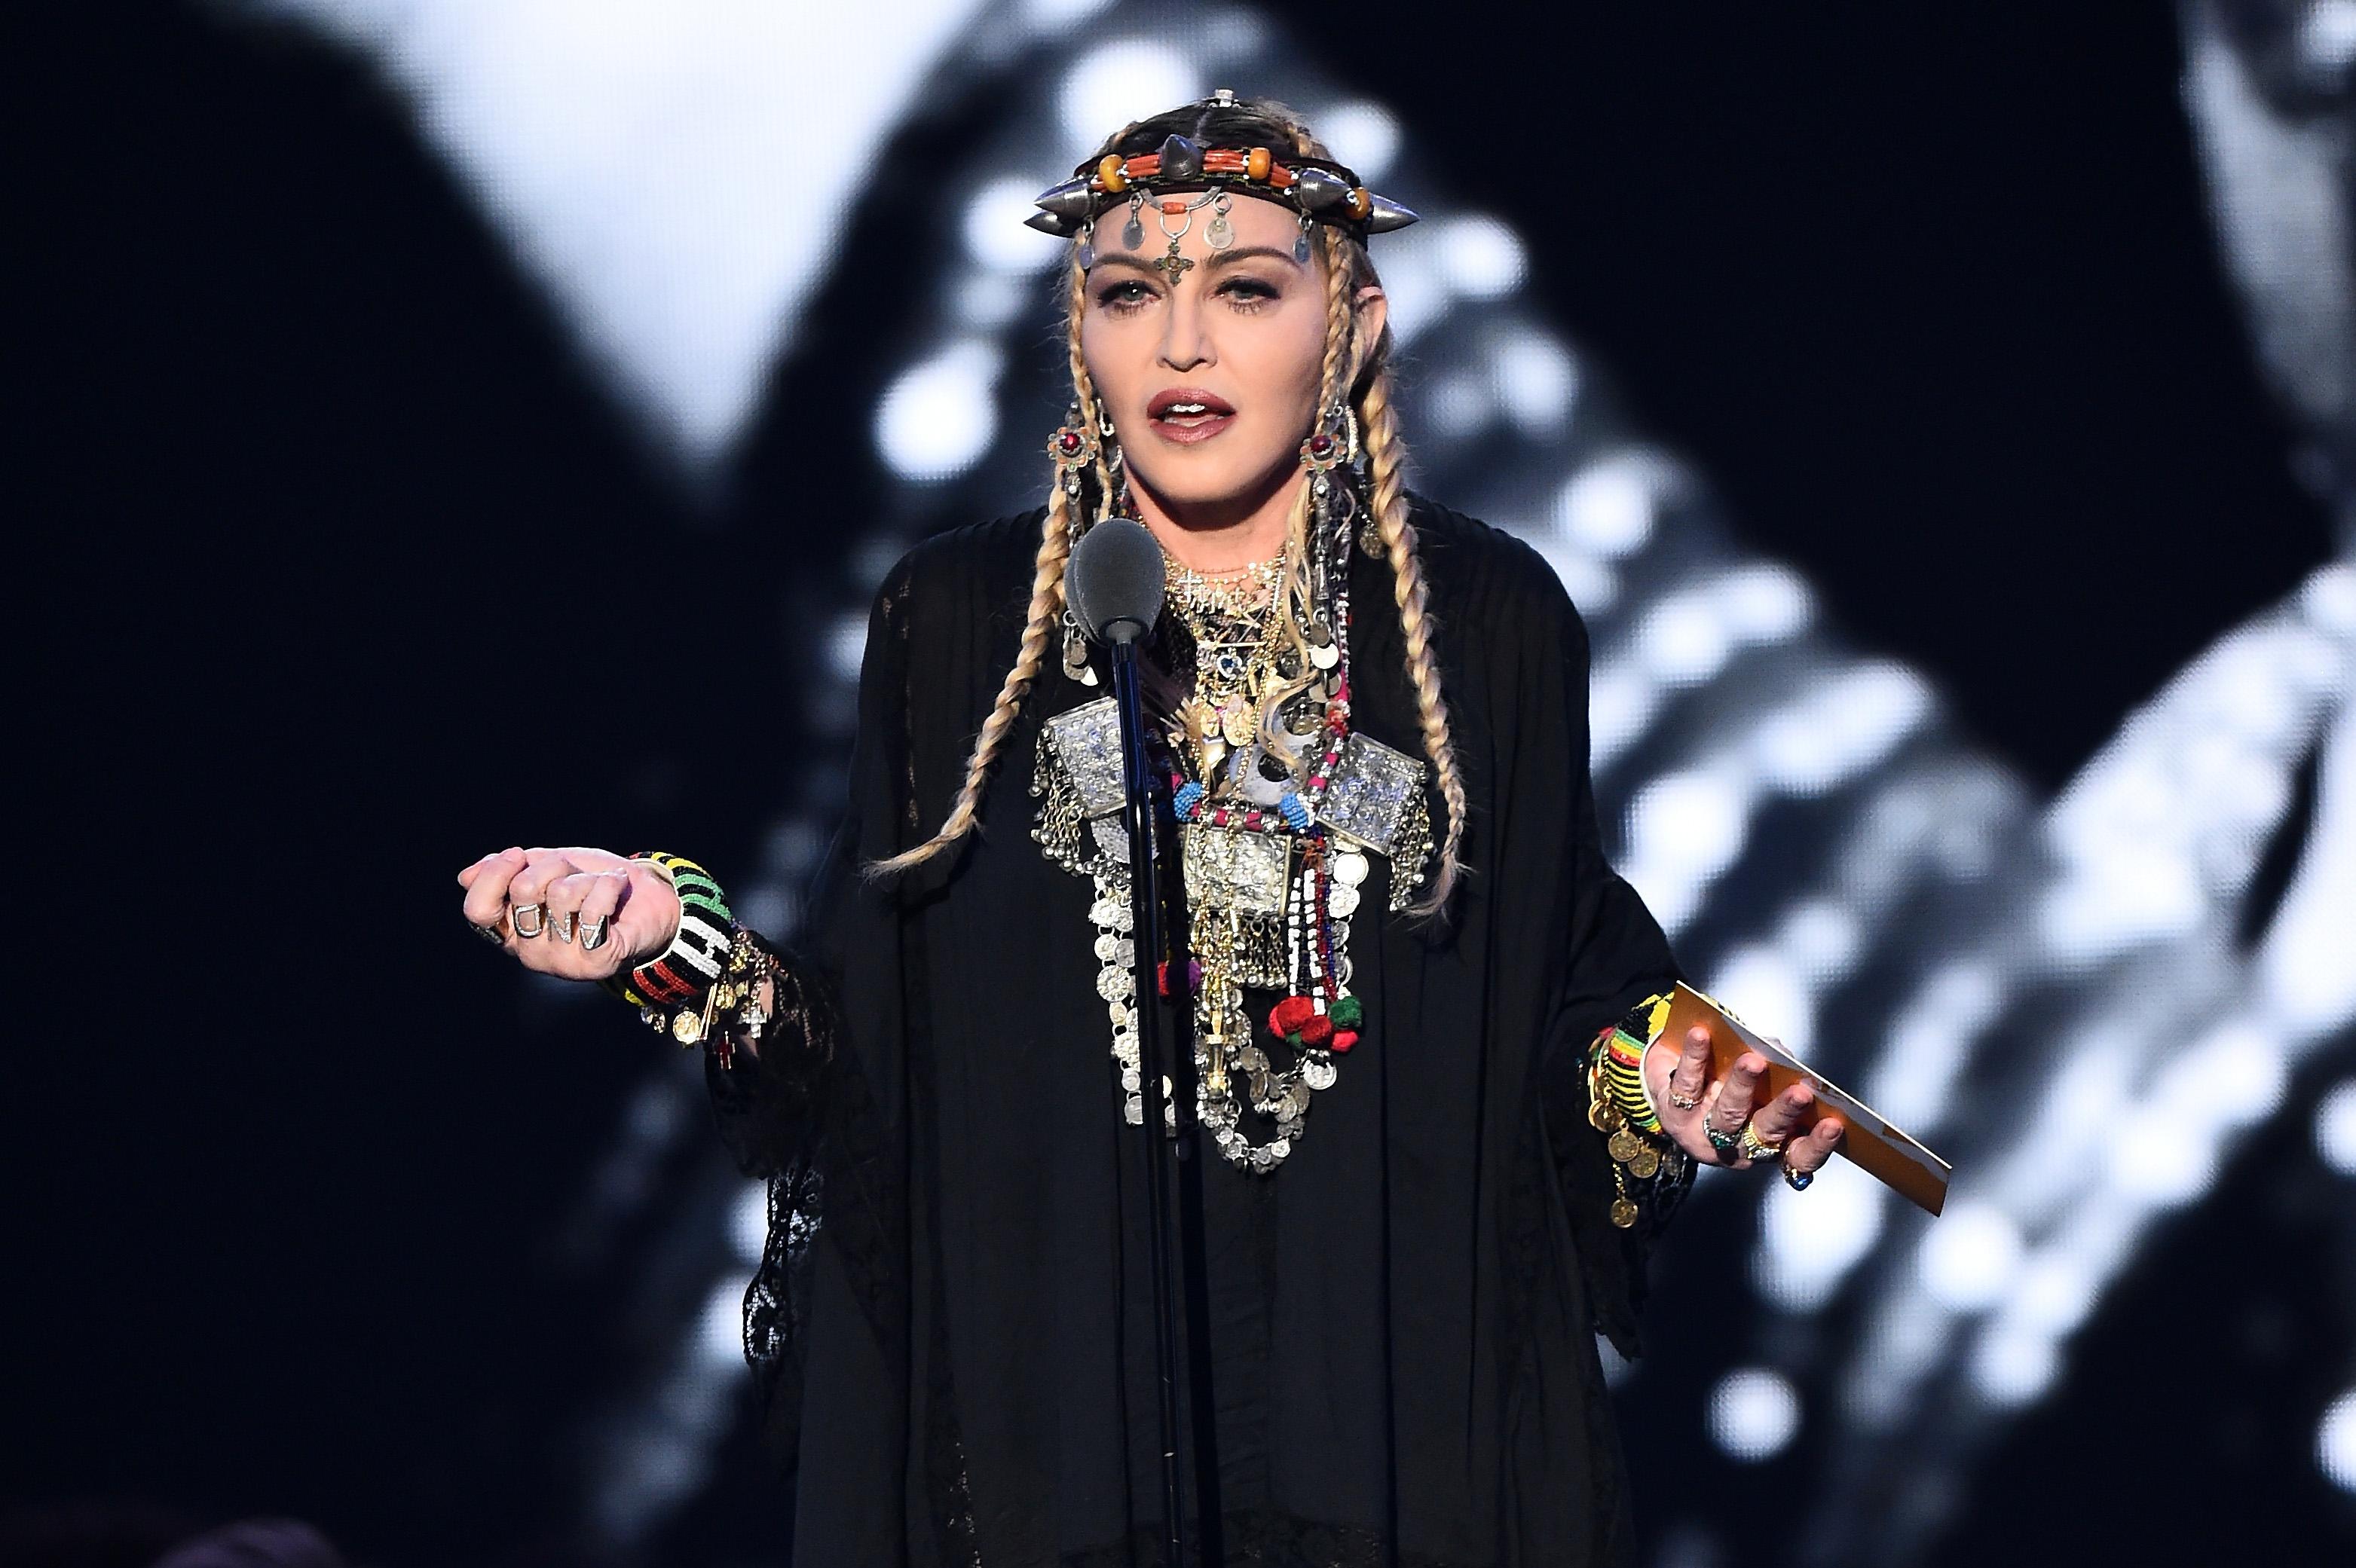 Madonna addresses Israel boycott controversy at Eurovision